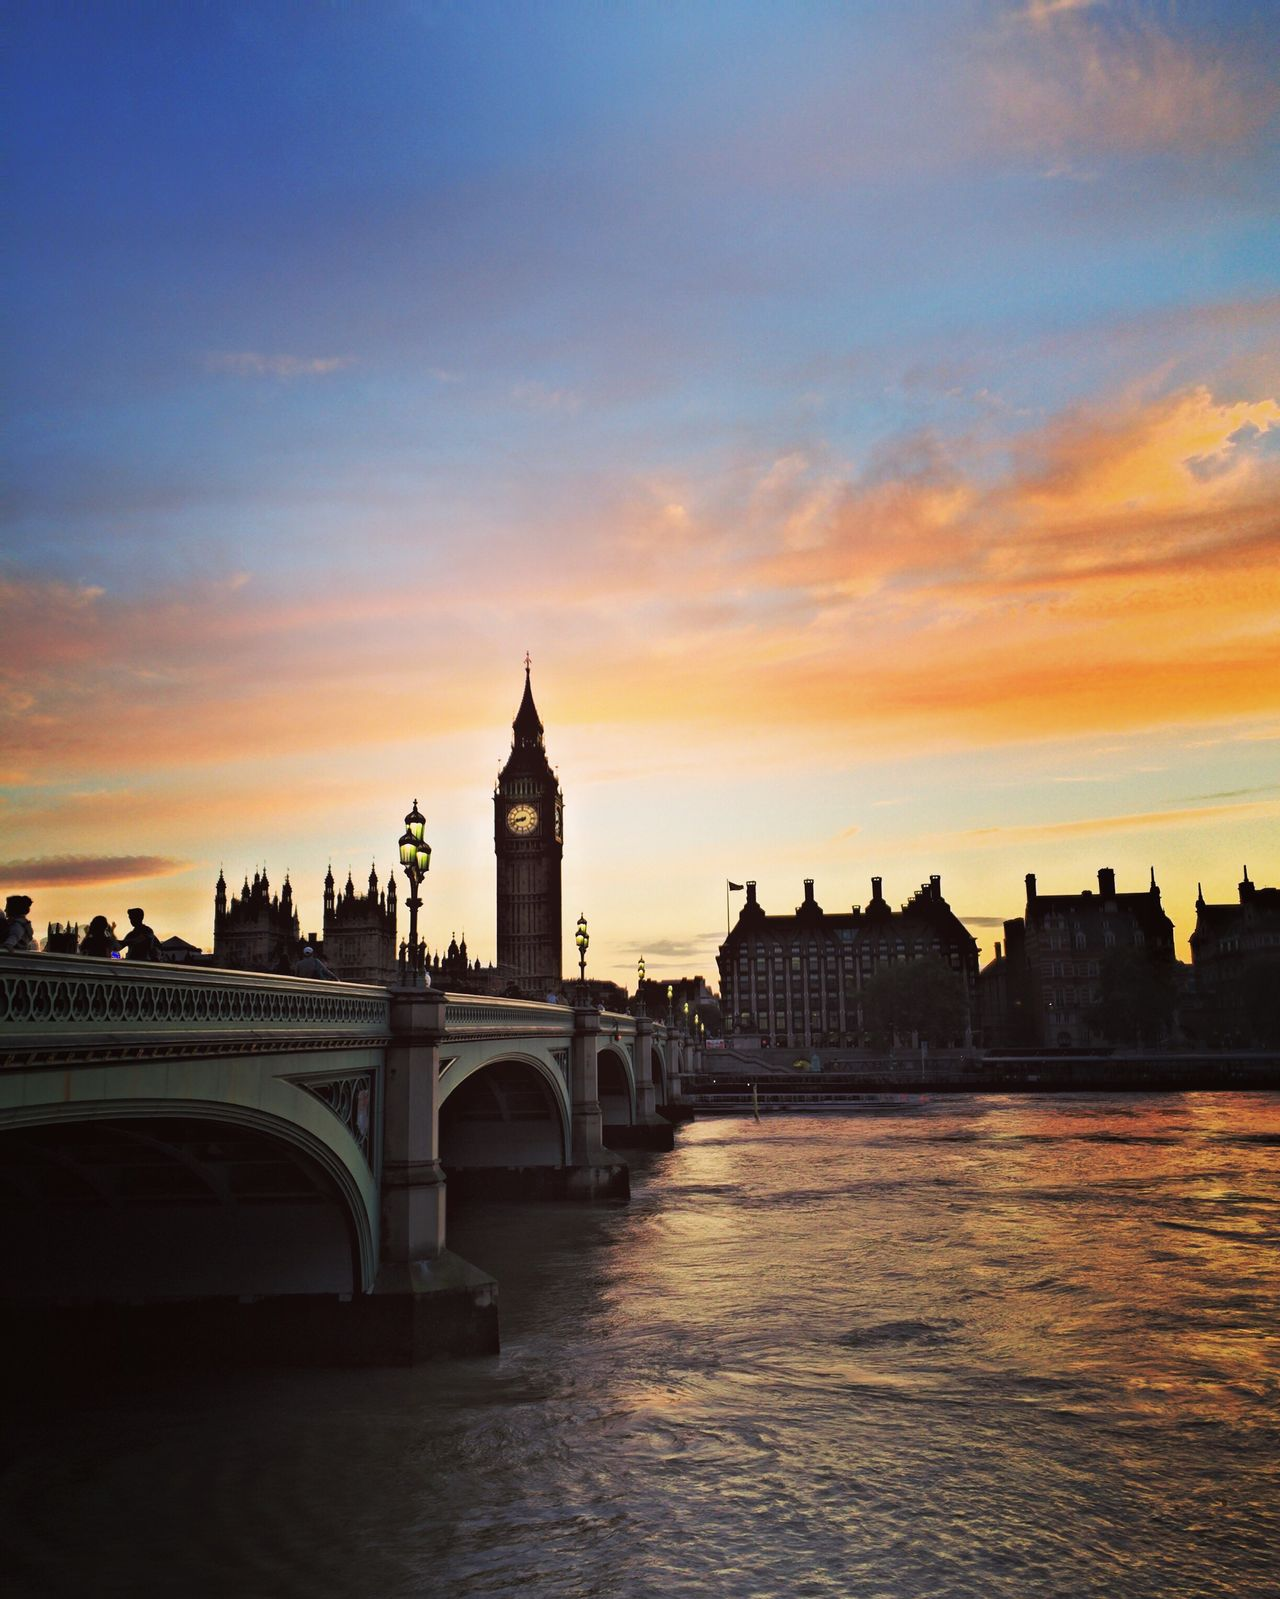 London Sunset Sunlight Sunset_collection Sunset Silhouettes Big Ben Bigben Riverside River View Bridge Parliment LONDON❤ London Bridge EyeEm Best Shots Battle Of The Cities BYOPaper! Sommergefühle